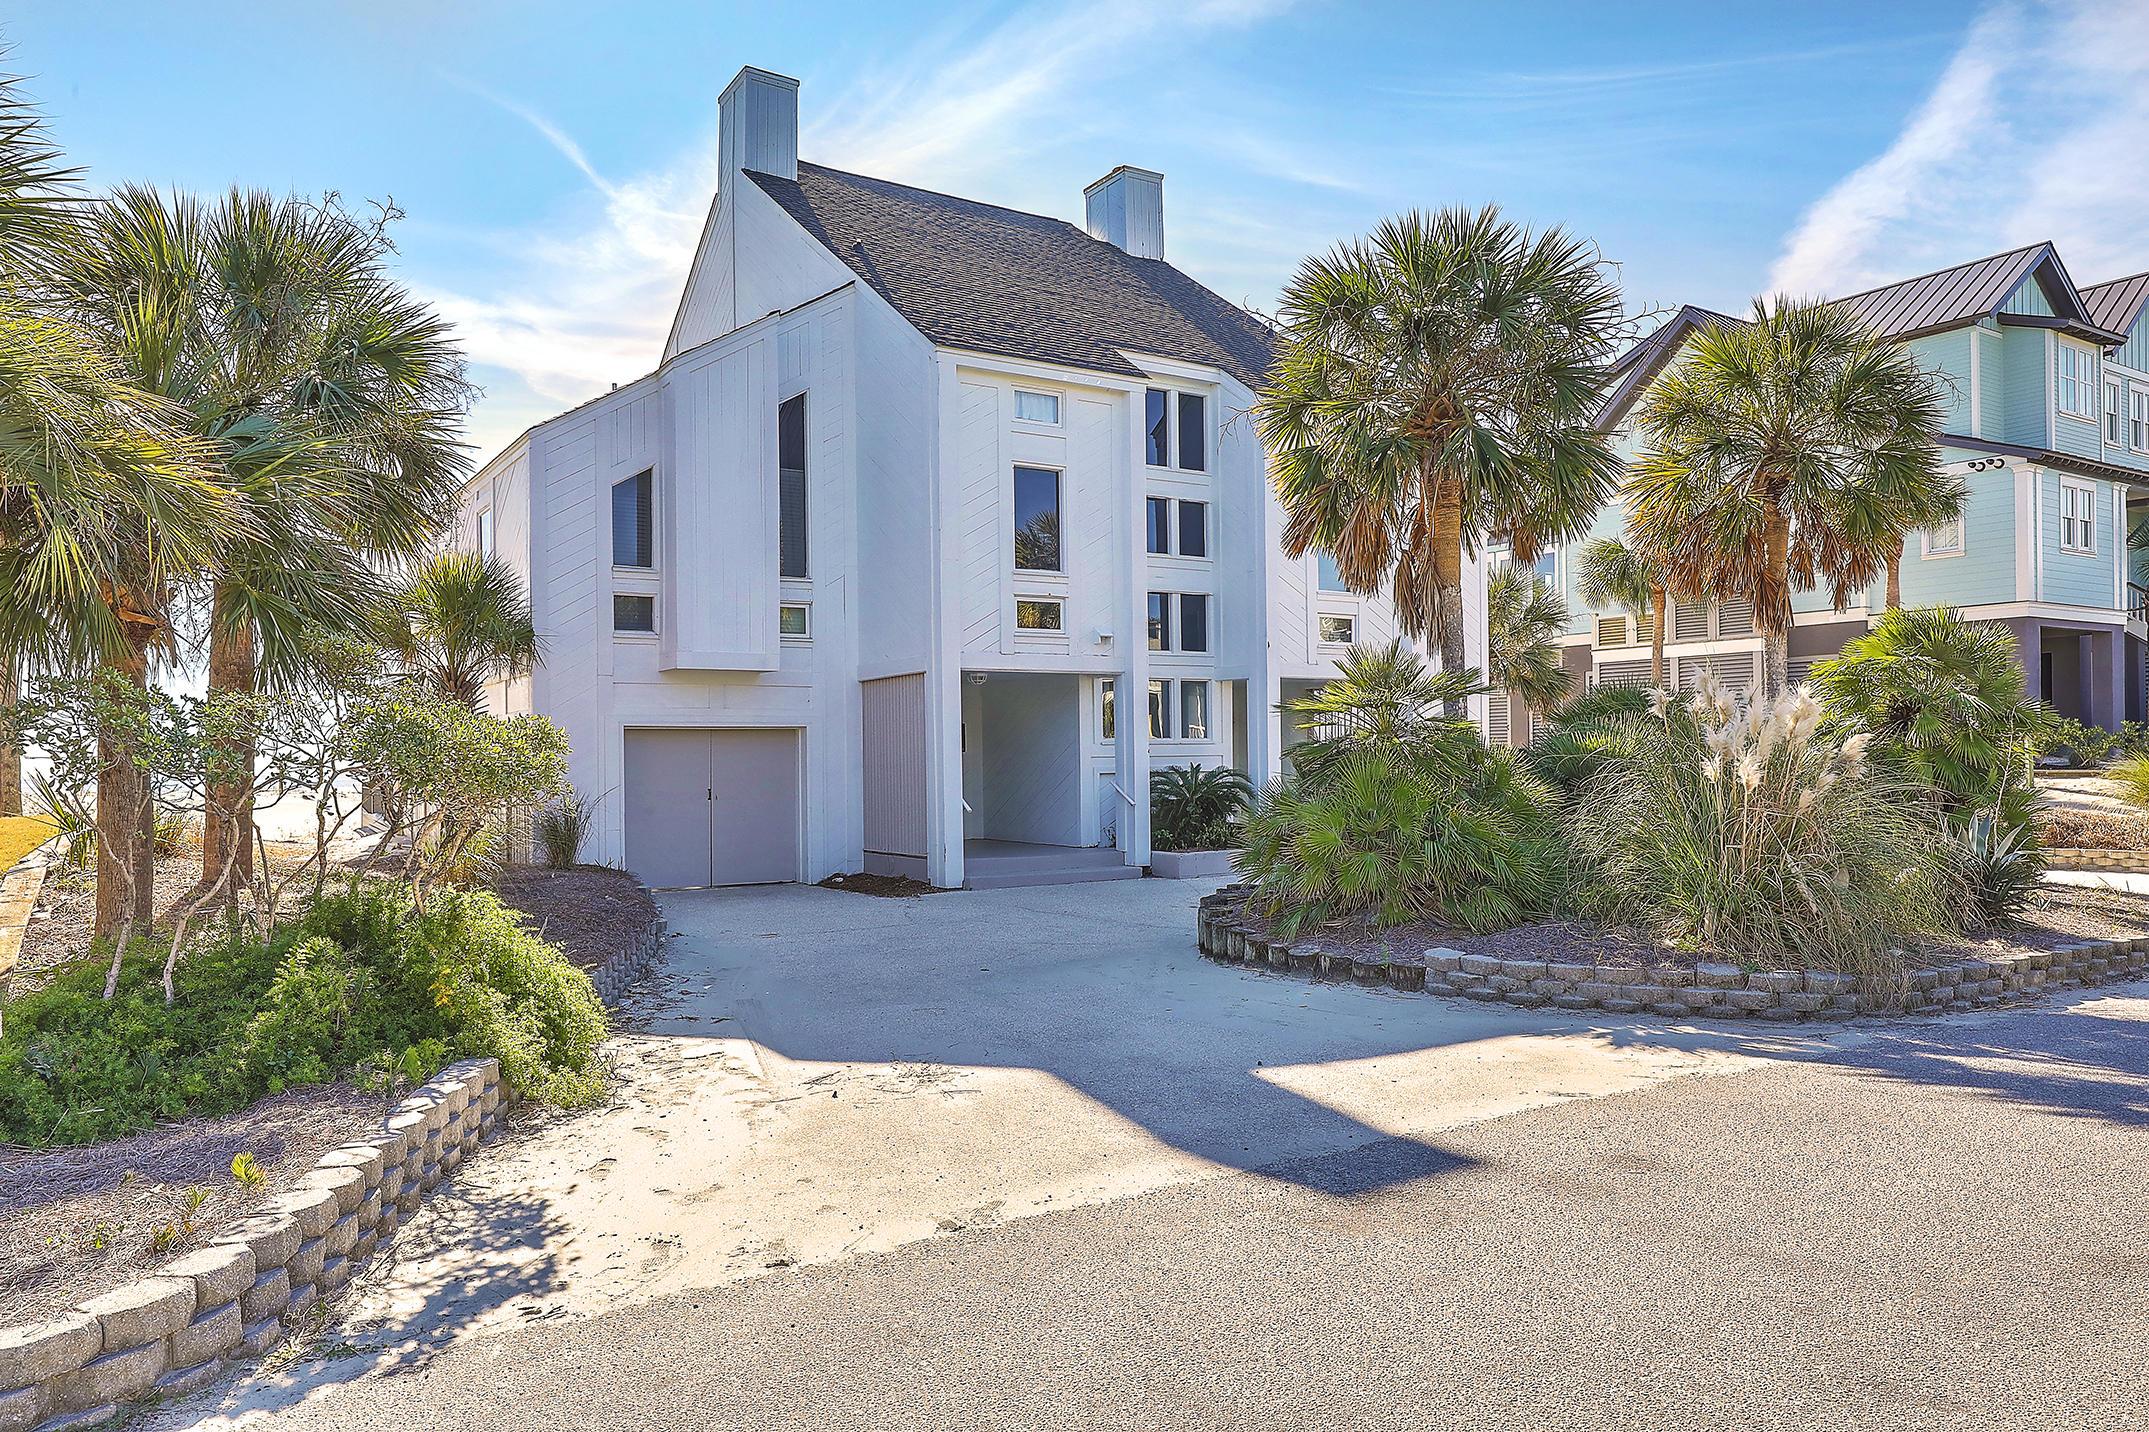 Wild Dunes Homes For Sale - 14 Beachwood East, Isle of Palms, SC - 5